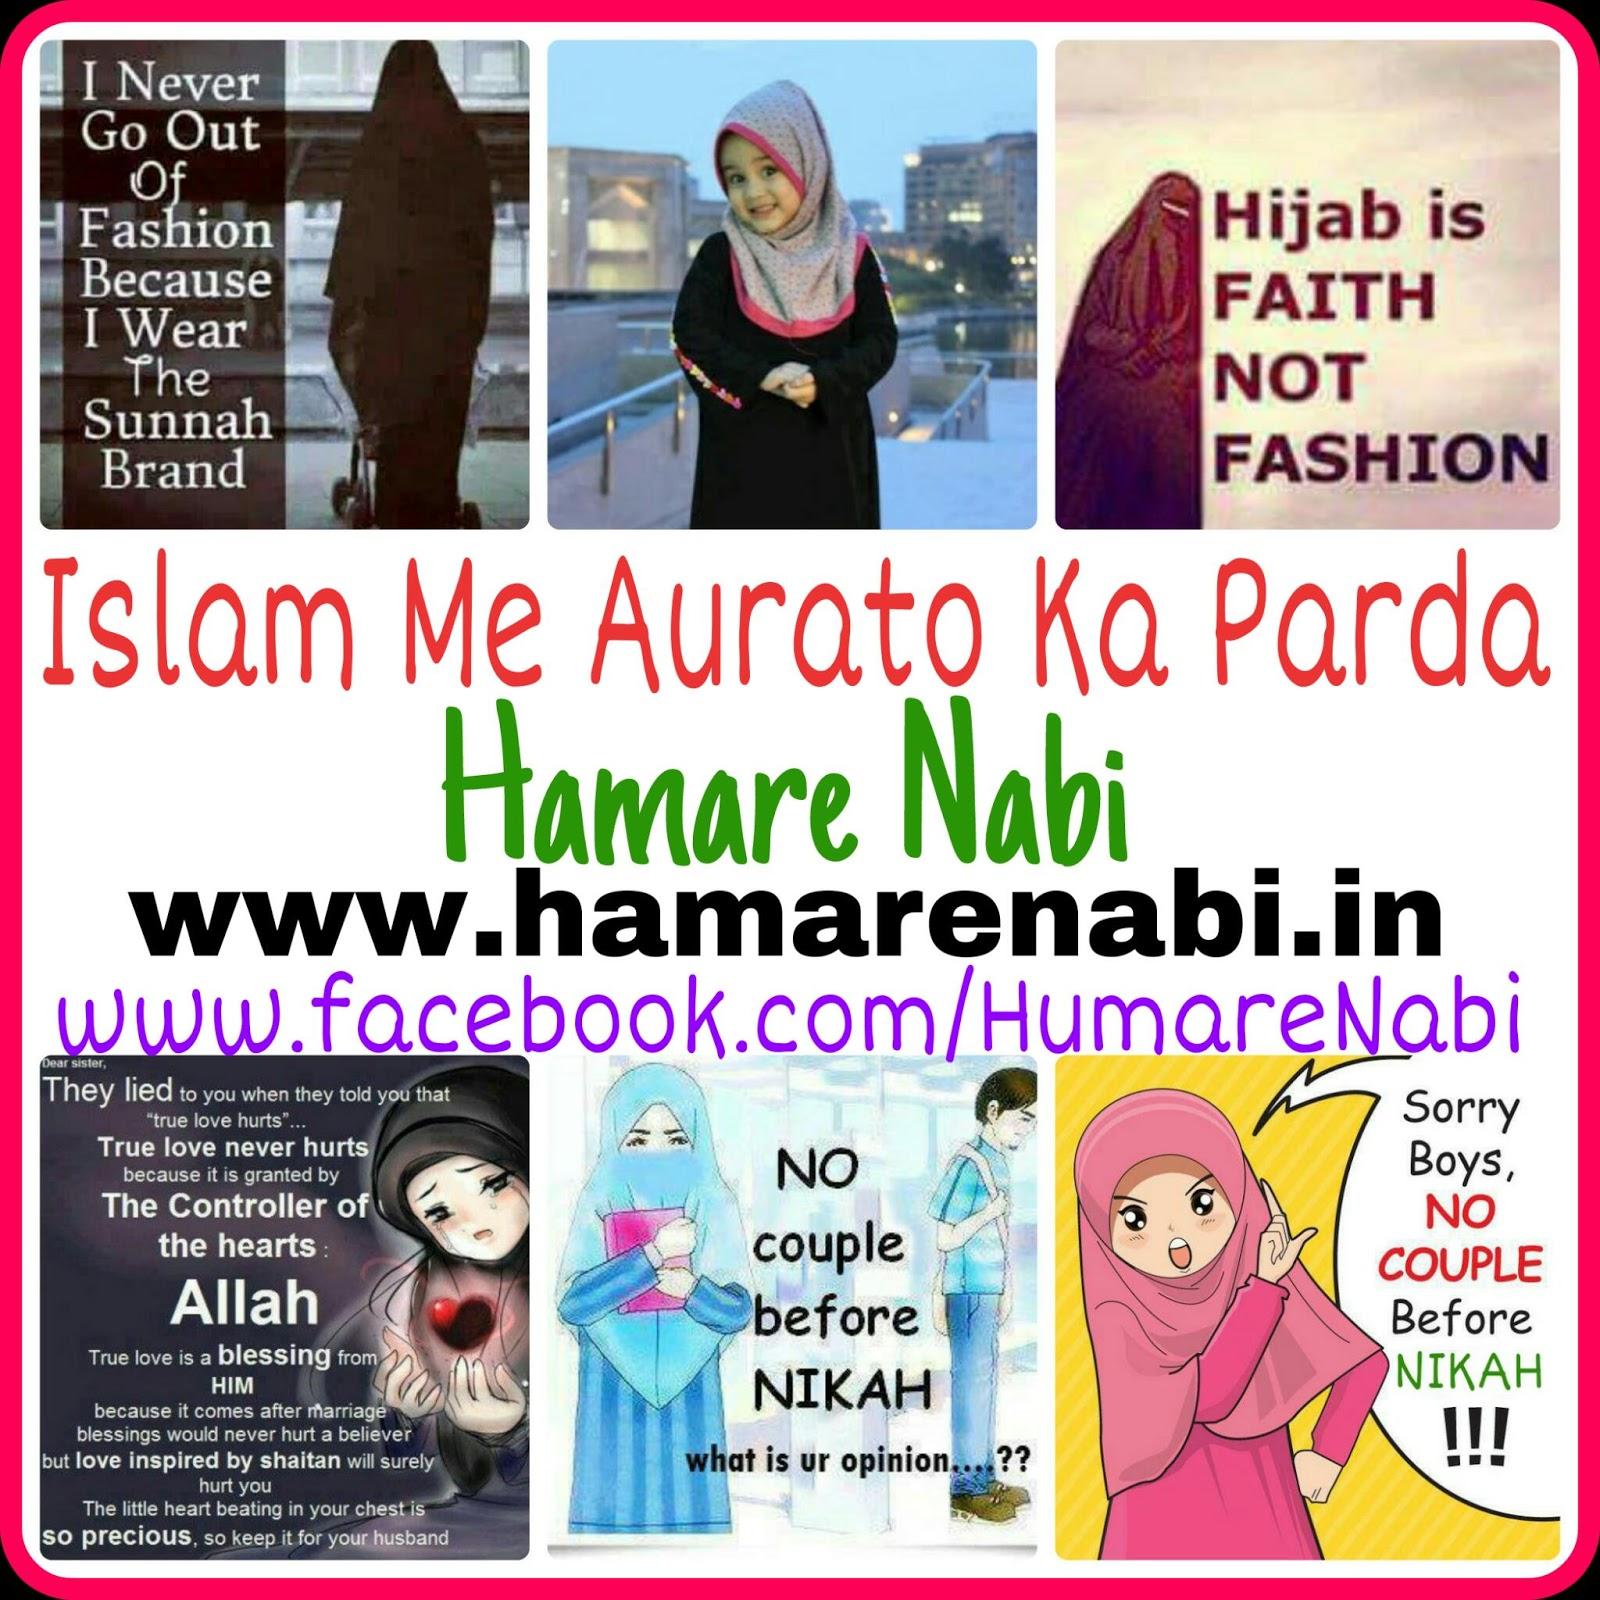 Islam Me Aurato Ko Parde Ka Huqm